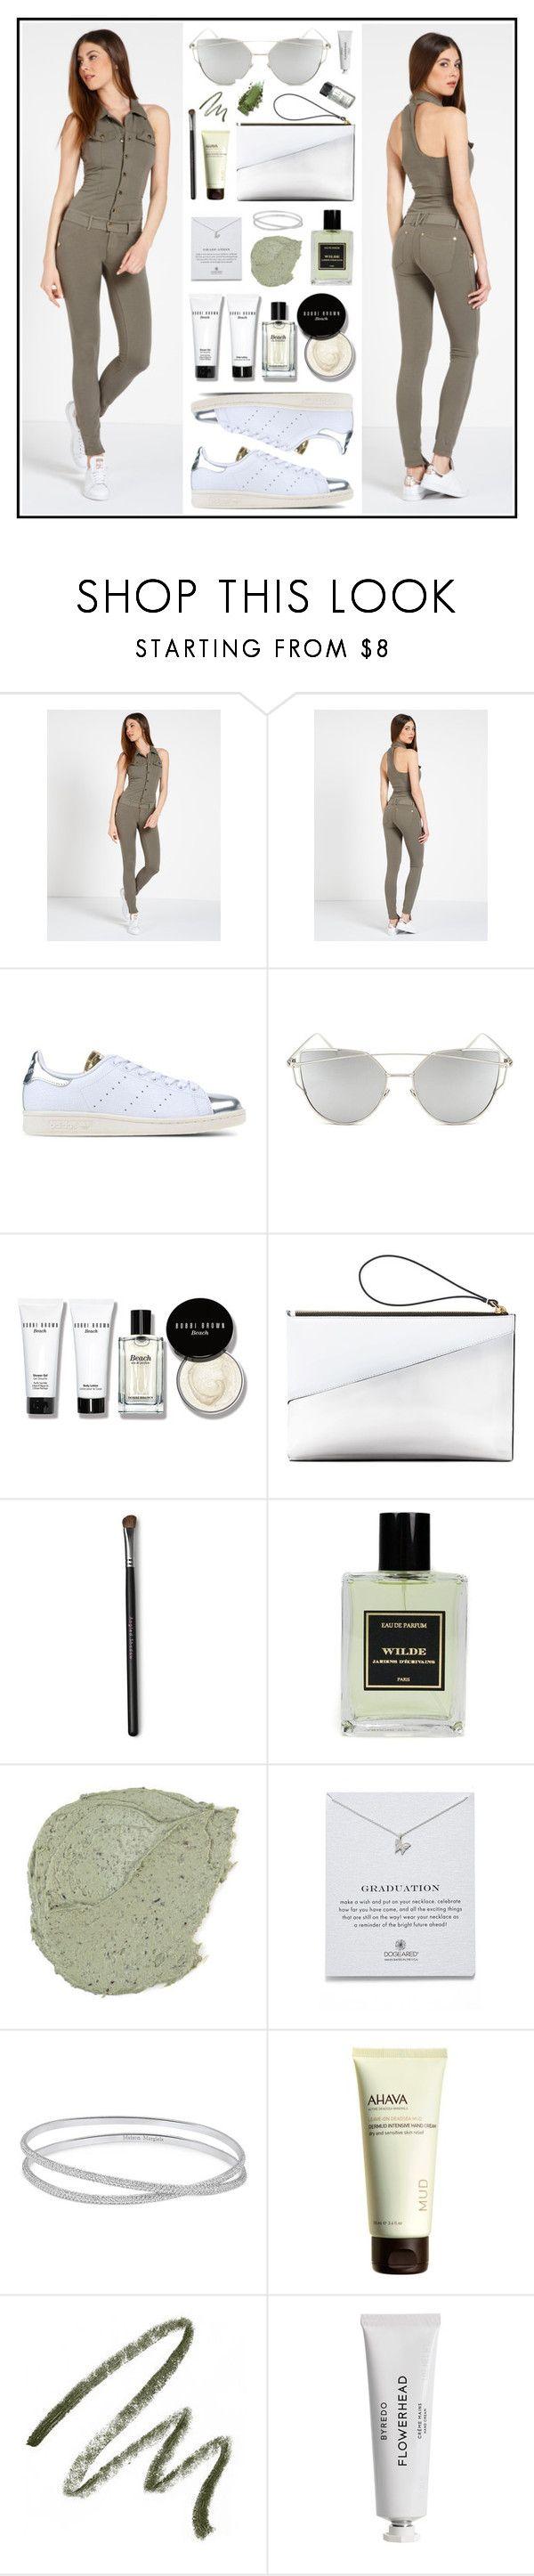 Monday comfy look! by metonweb on Polyvore featuring moda, adidas Originals, Marni, Dogeared, Maison Margiela, Chicnova Fashion, Bobbi Brown Cosmetics, Laura Mercier, Ahava and Byredo